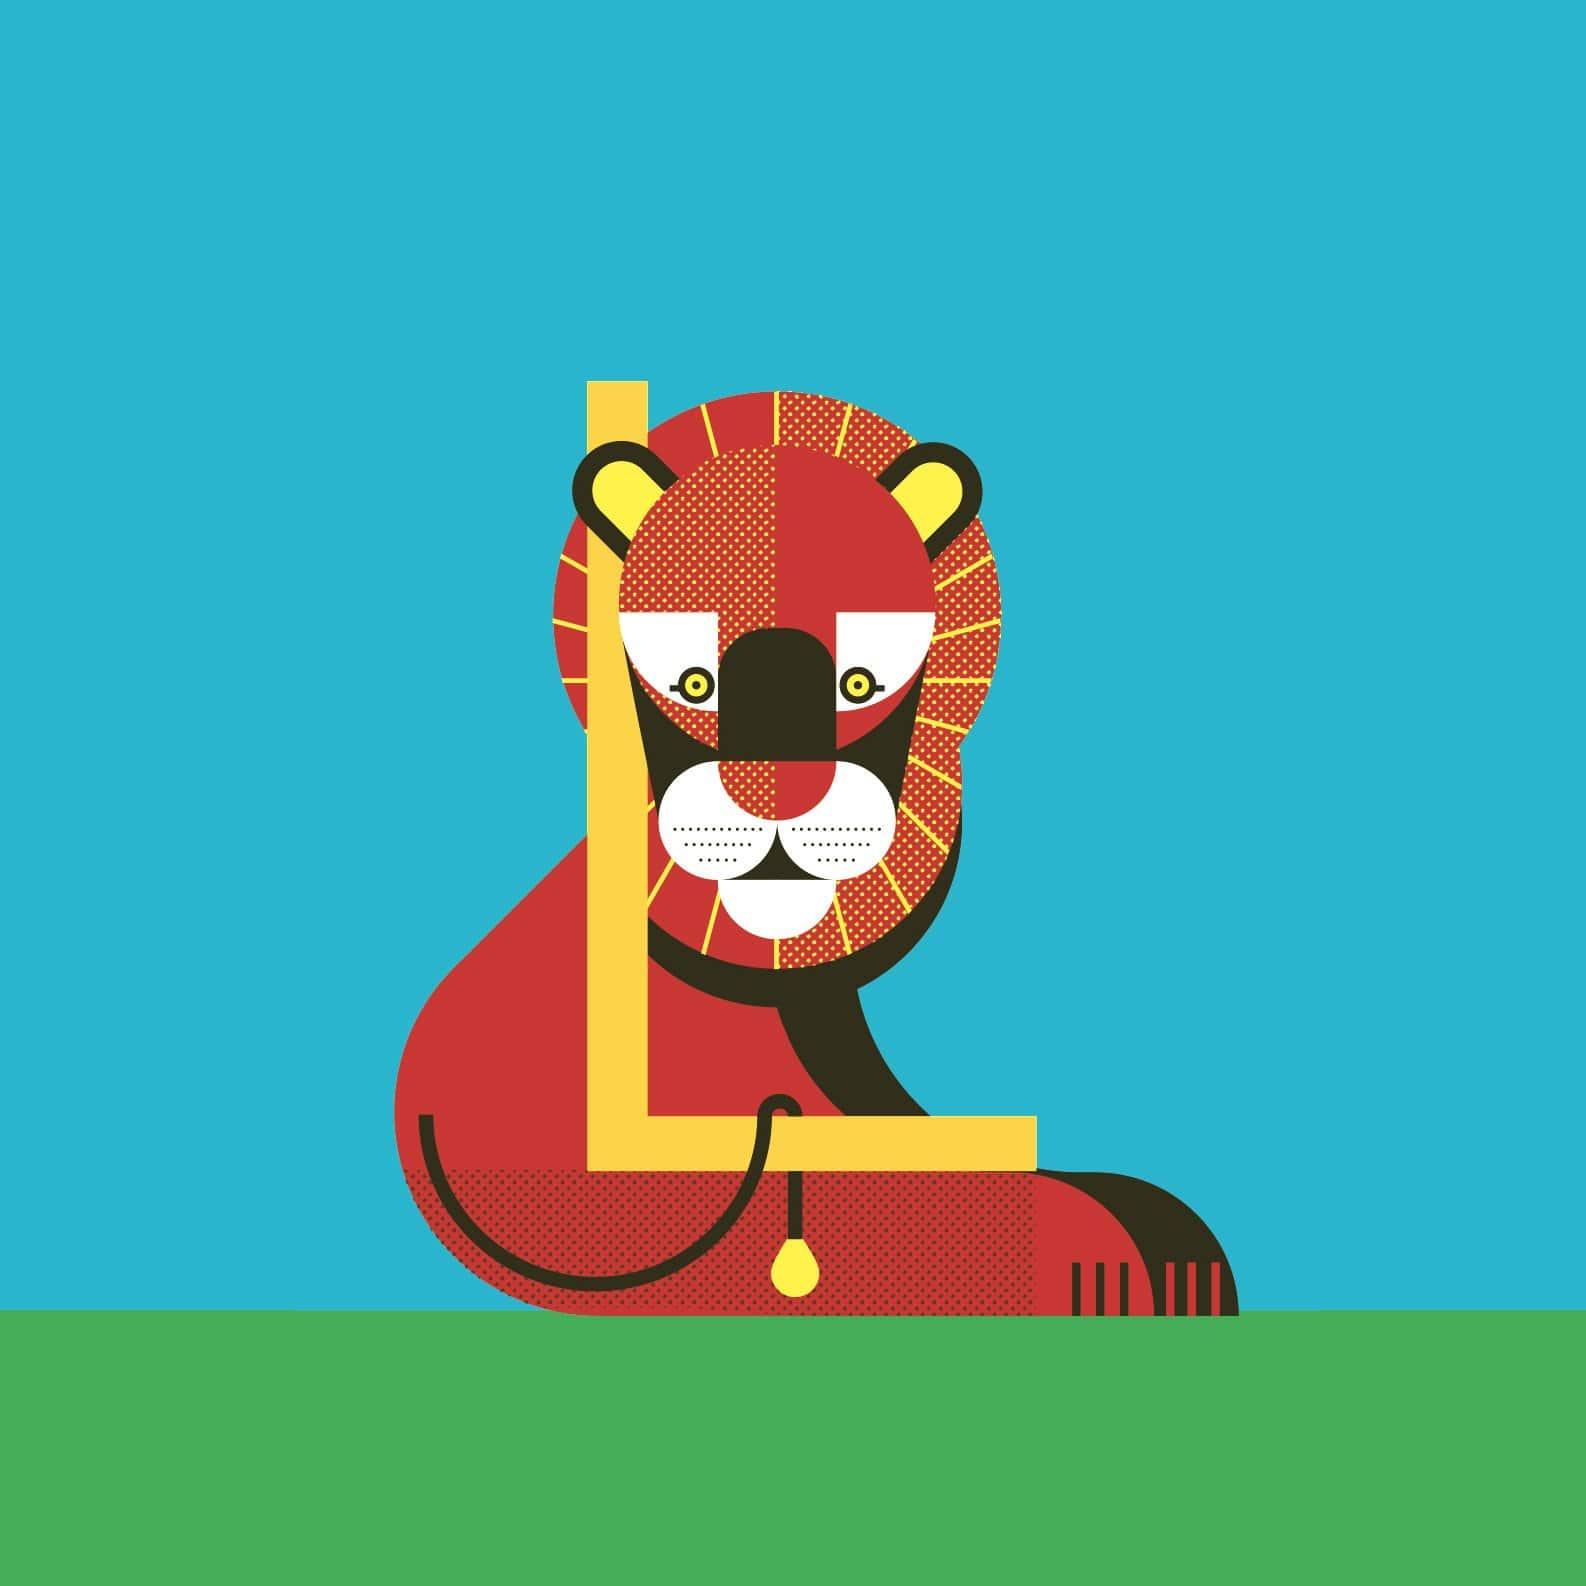 alice-iuri-poster-animal-lion-illustration